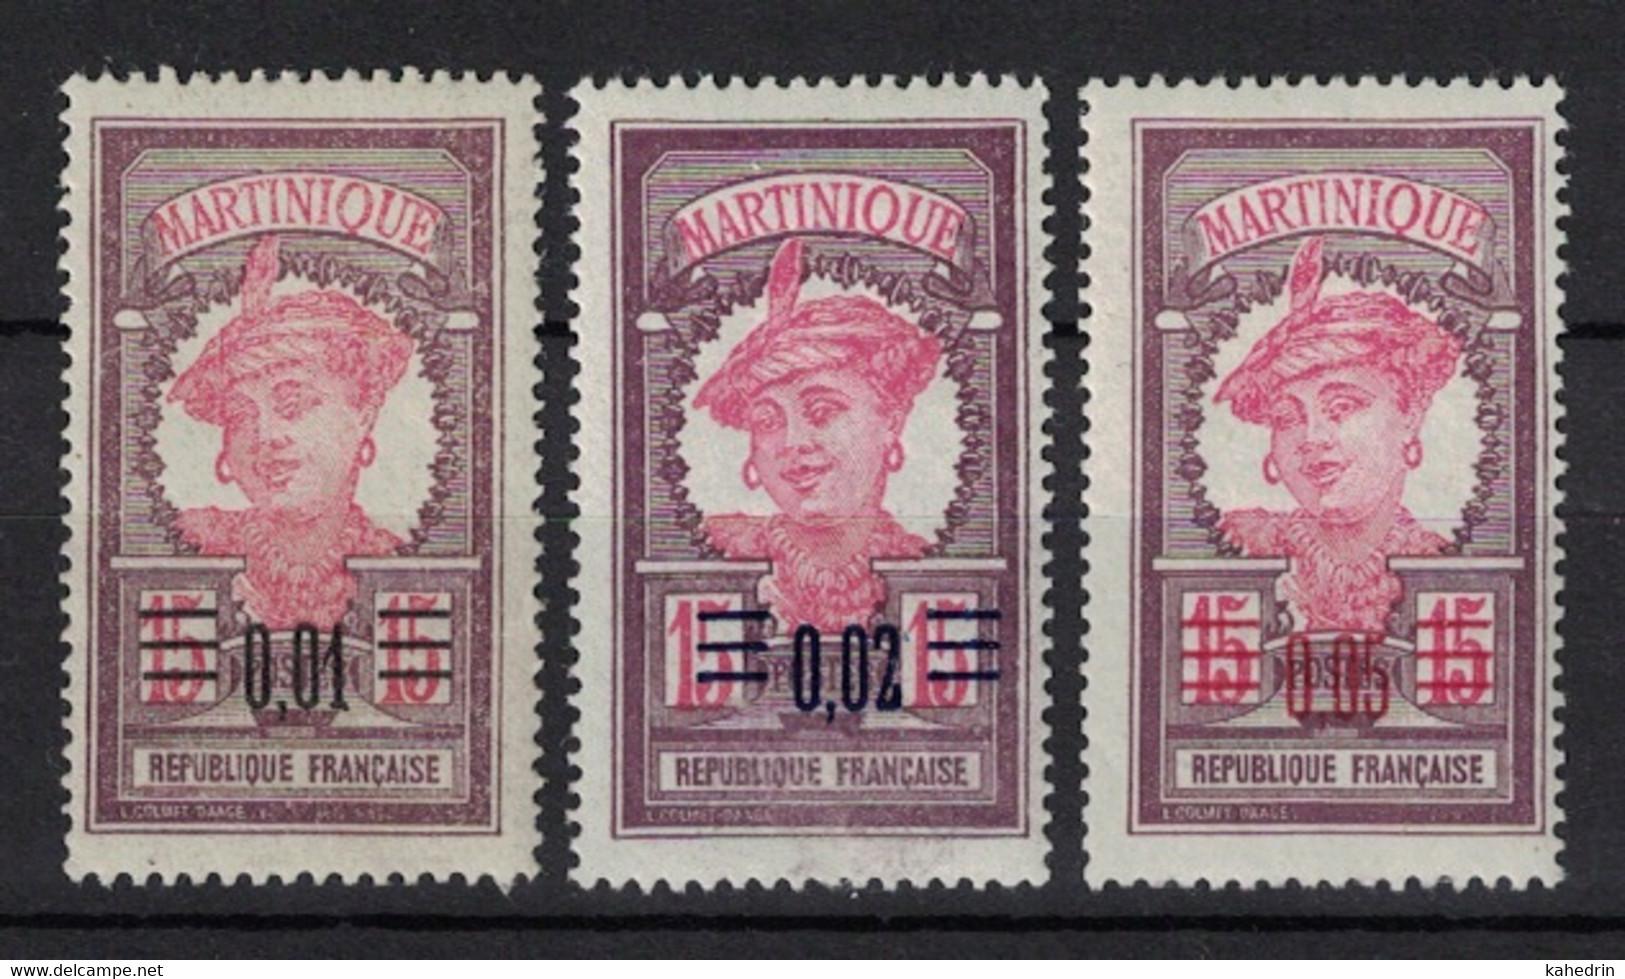 Martinique 1922, Lot Of 3 Stamps With Overprint **, MNH - Gebruikt